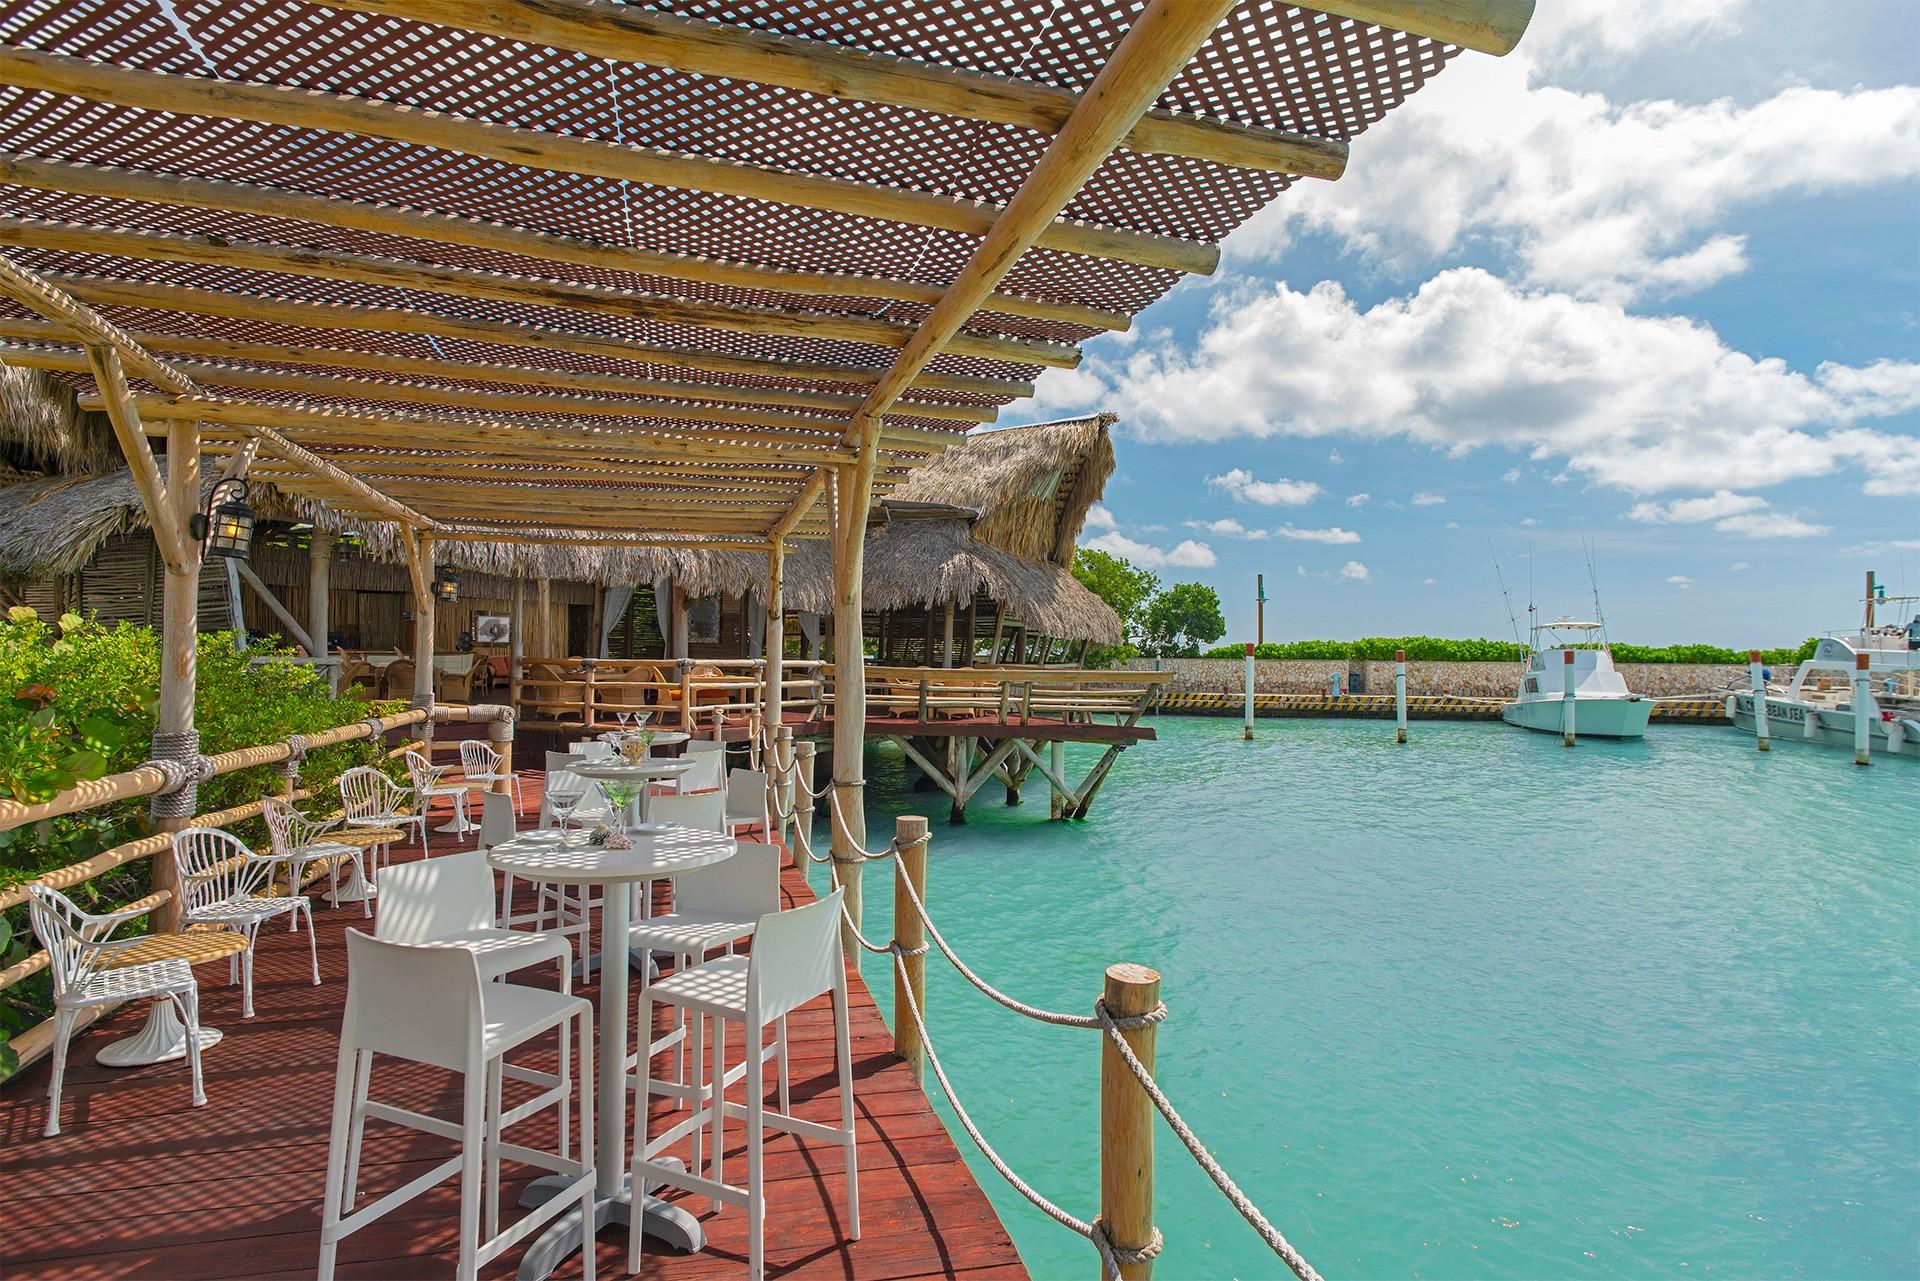 restaurants in punta cana, best restaurants in punta cana, punta cana food, where to eat in punta cana, la yola